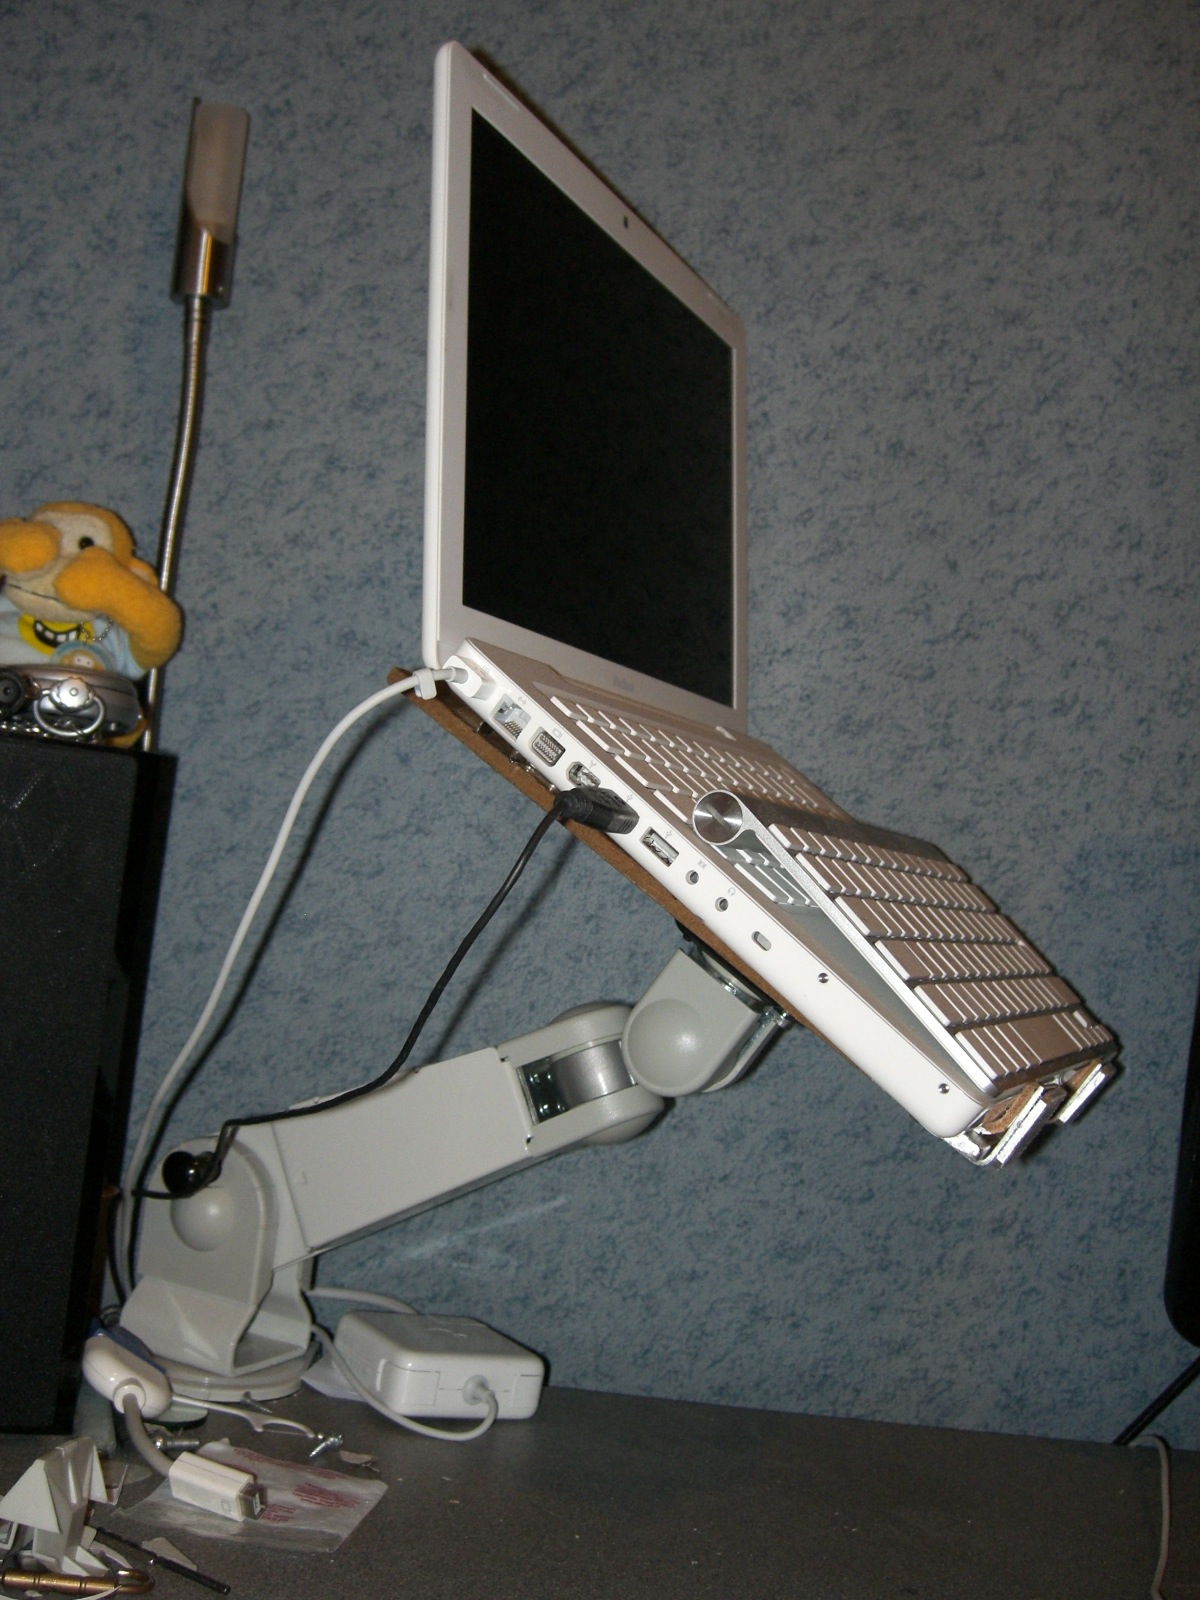 Adjustable Vesa Arm Laptop Stand